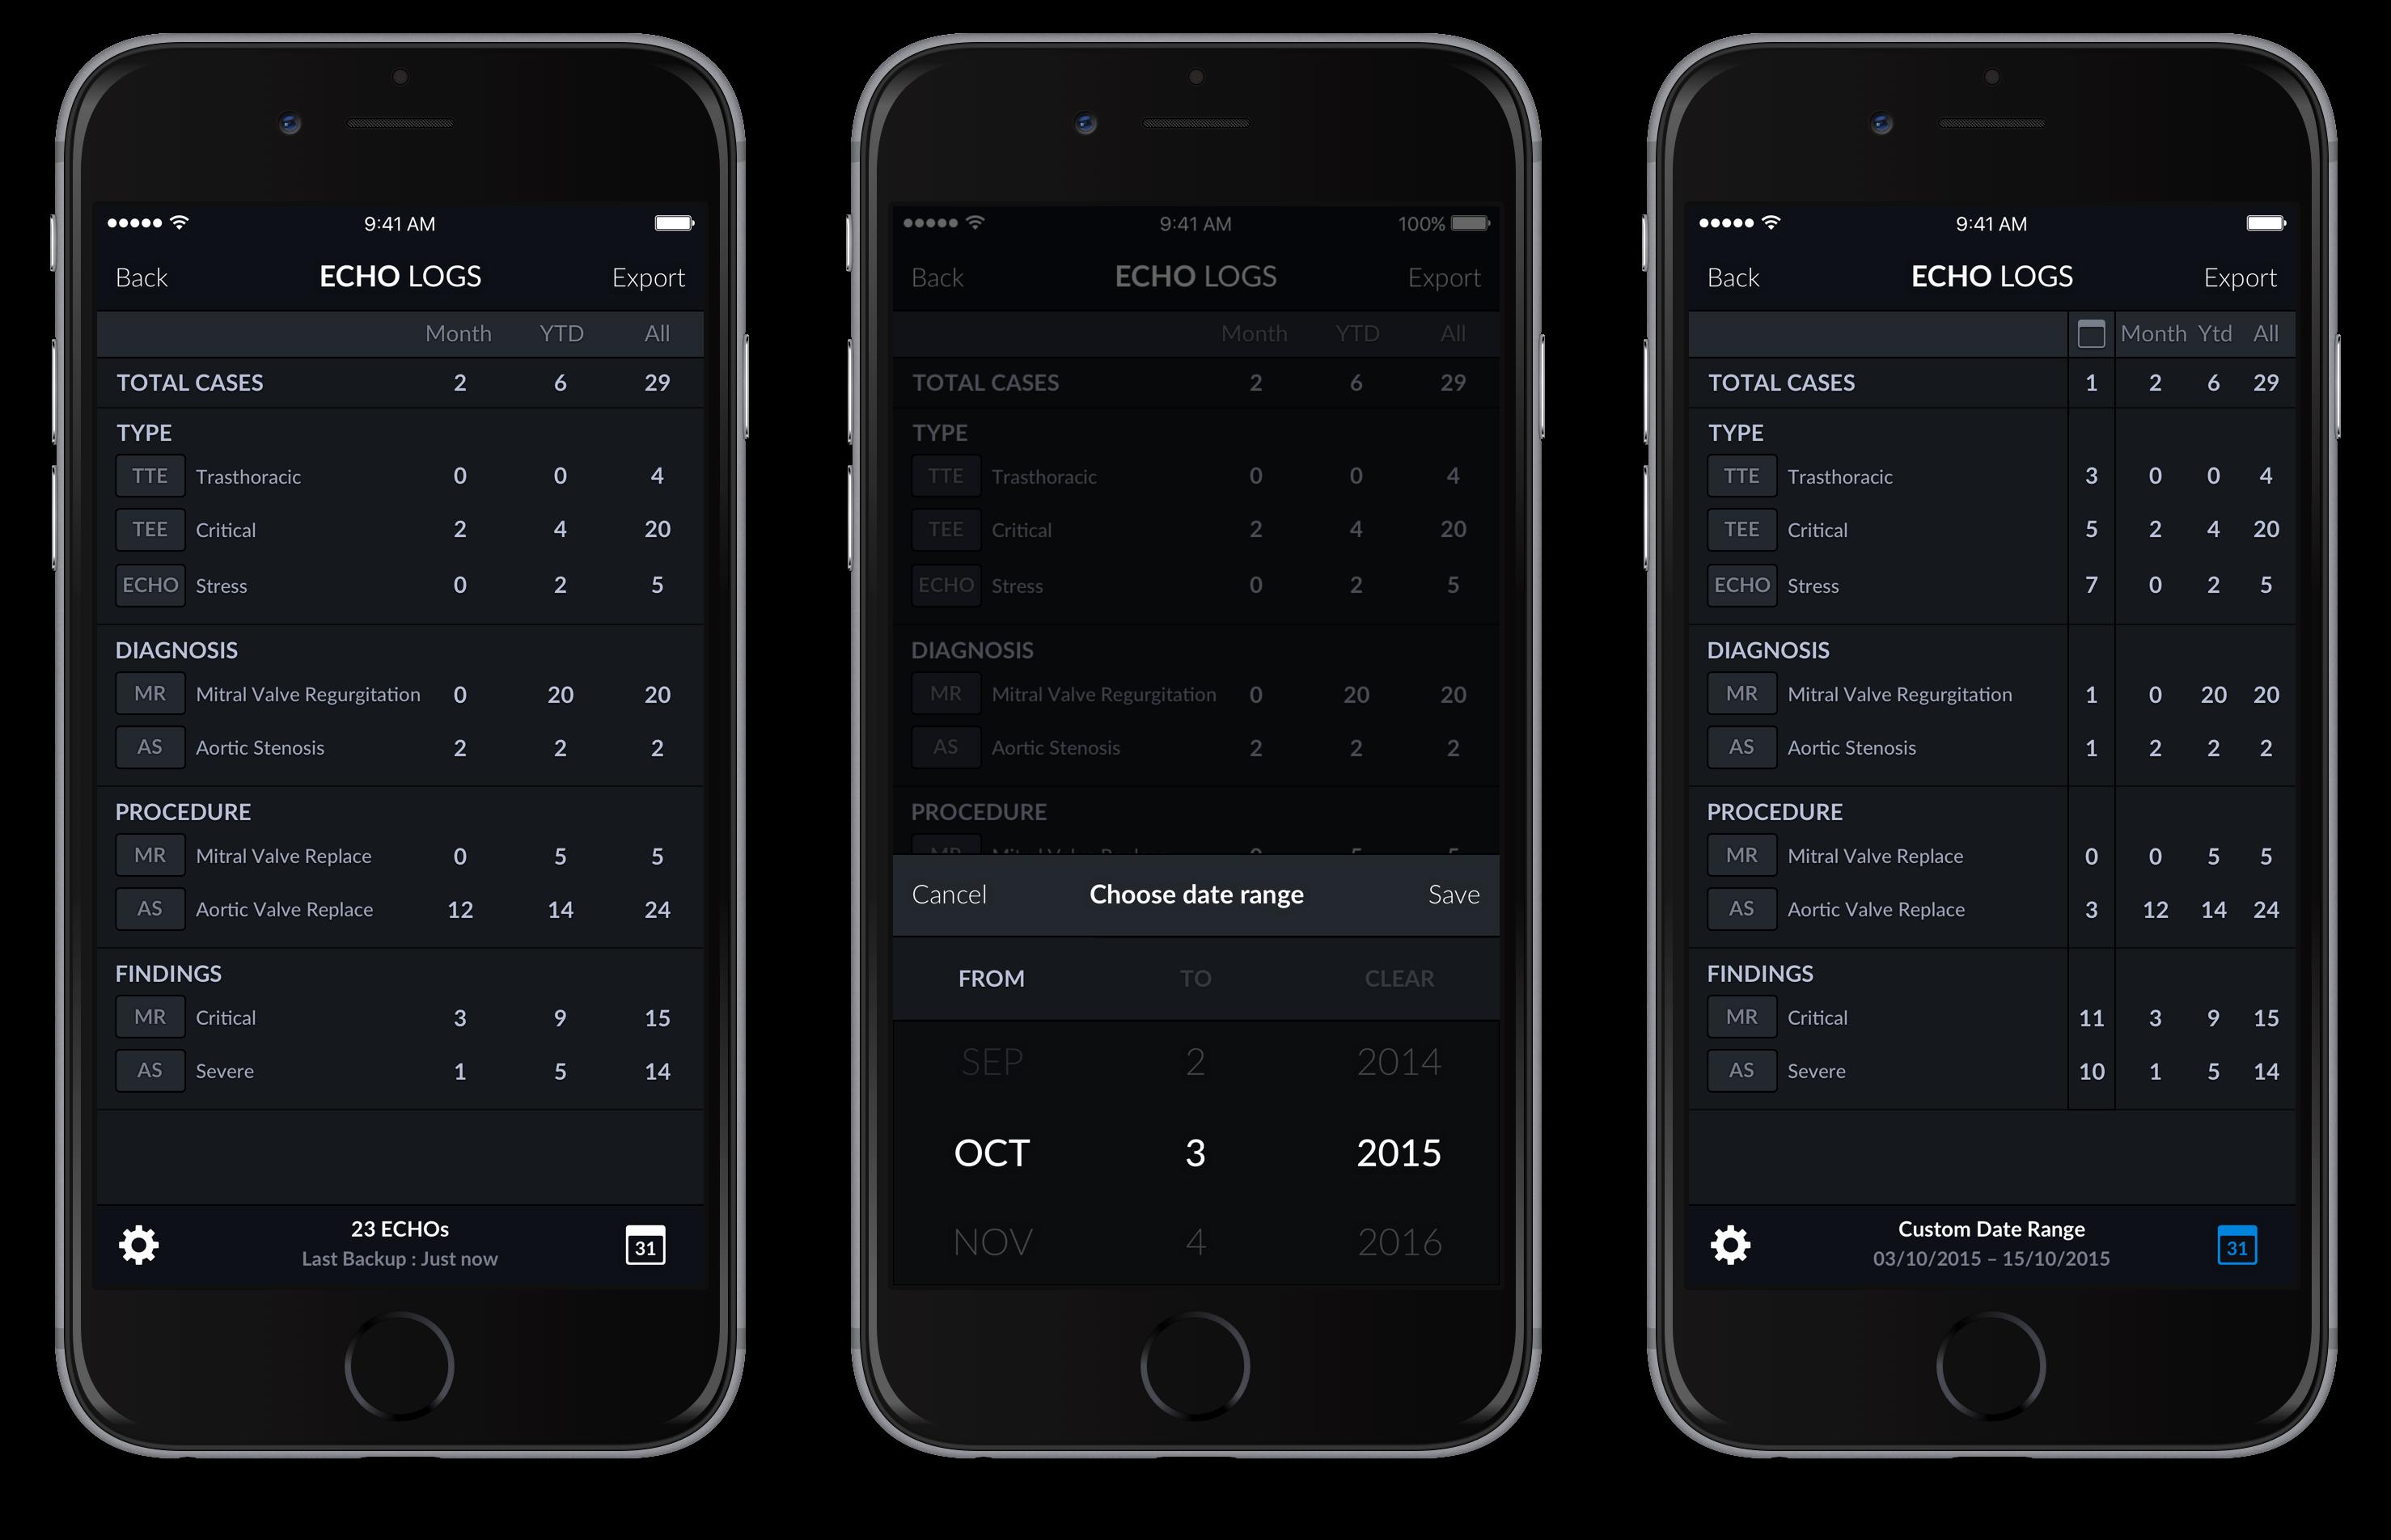 Echo Logs – iPhone 4